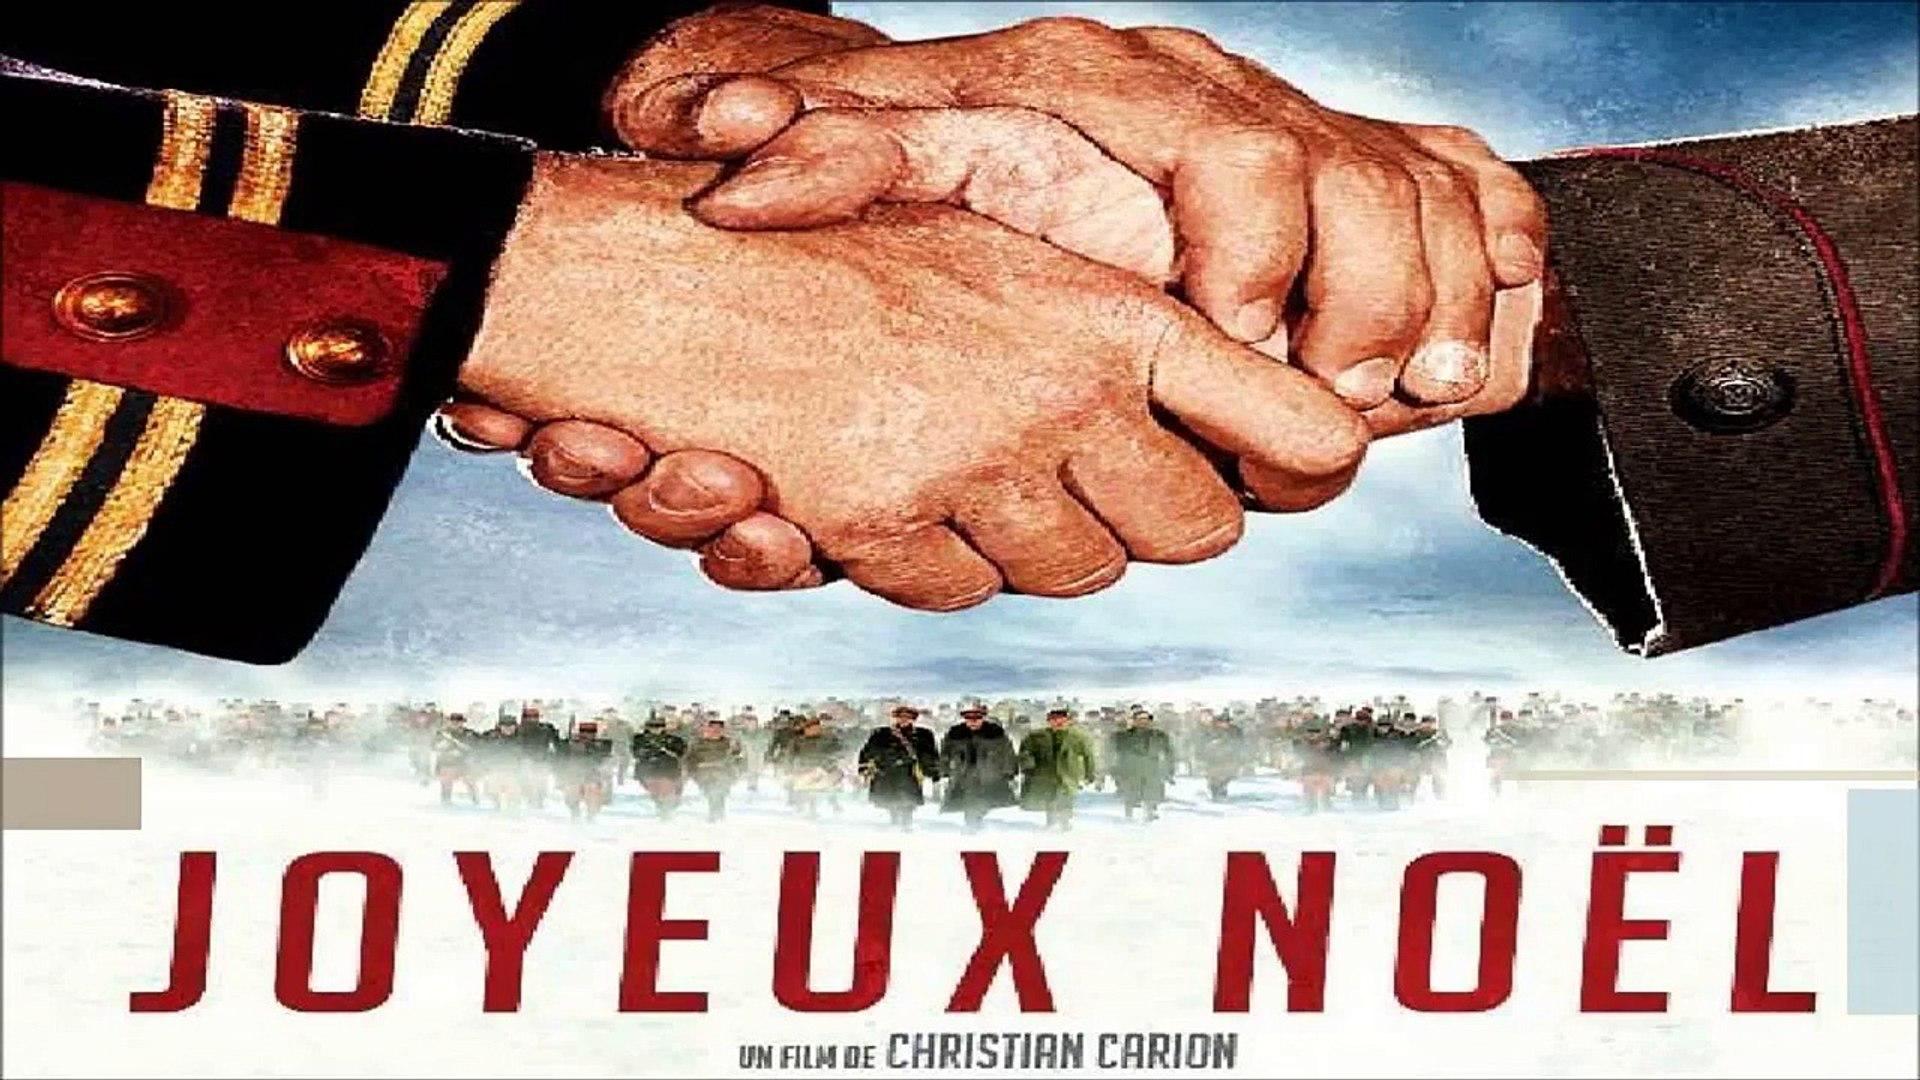 Film Joyeux Noel De Christian Carion.Joyeux Noel Haine Partagee Scene Mythique